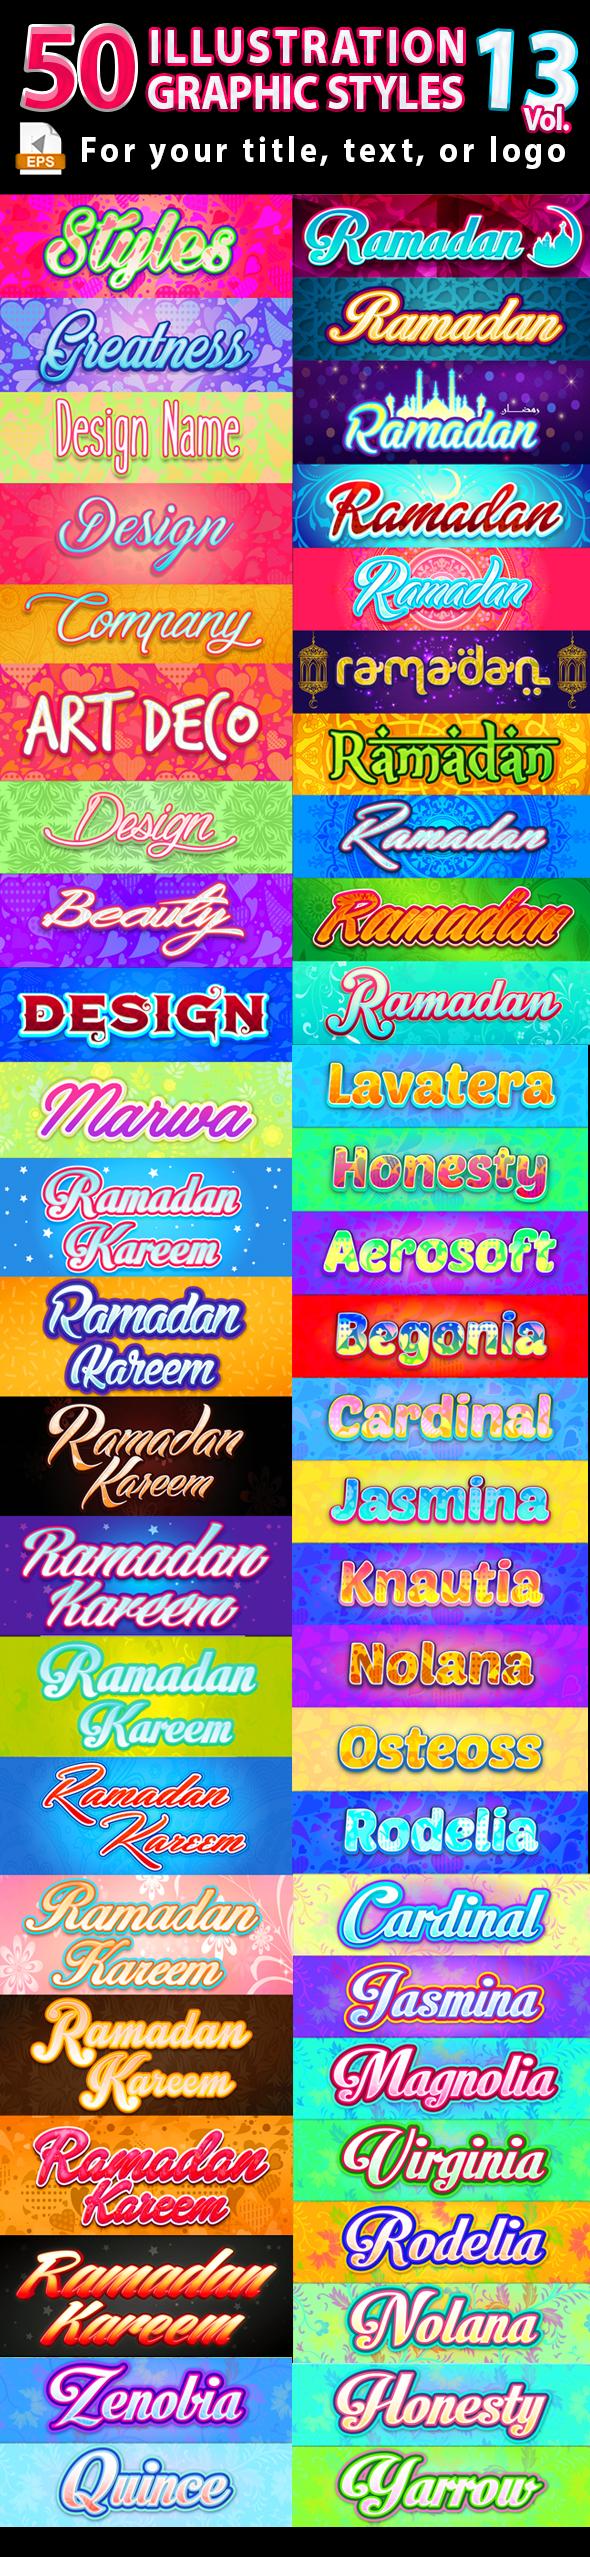 50 Illustrator Graphic Styles Vol.13 - Styles Illustrator